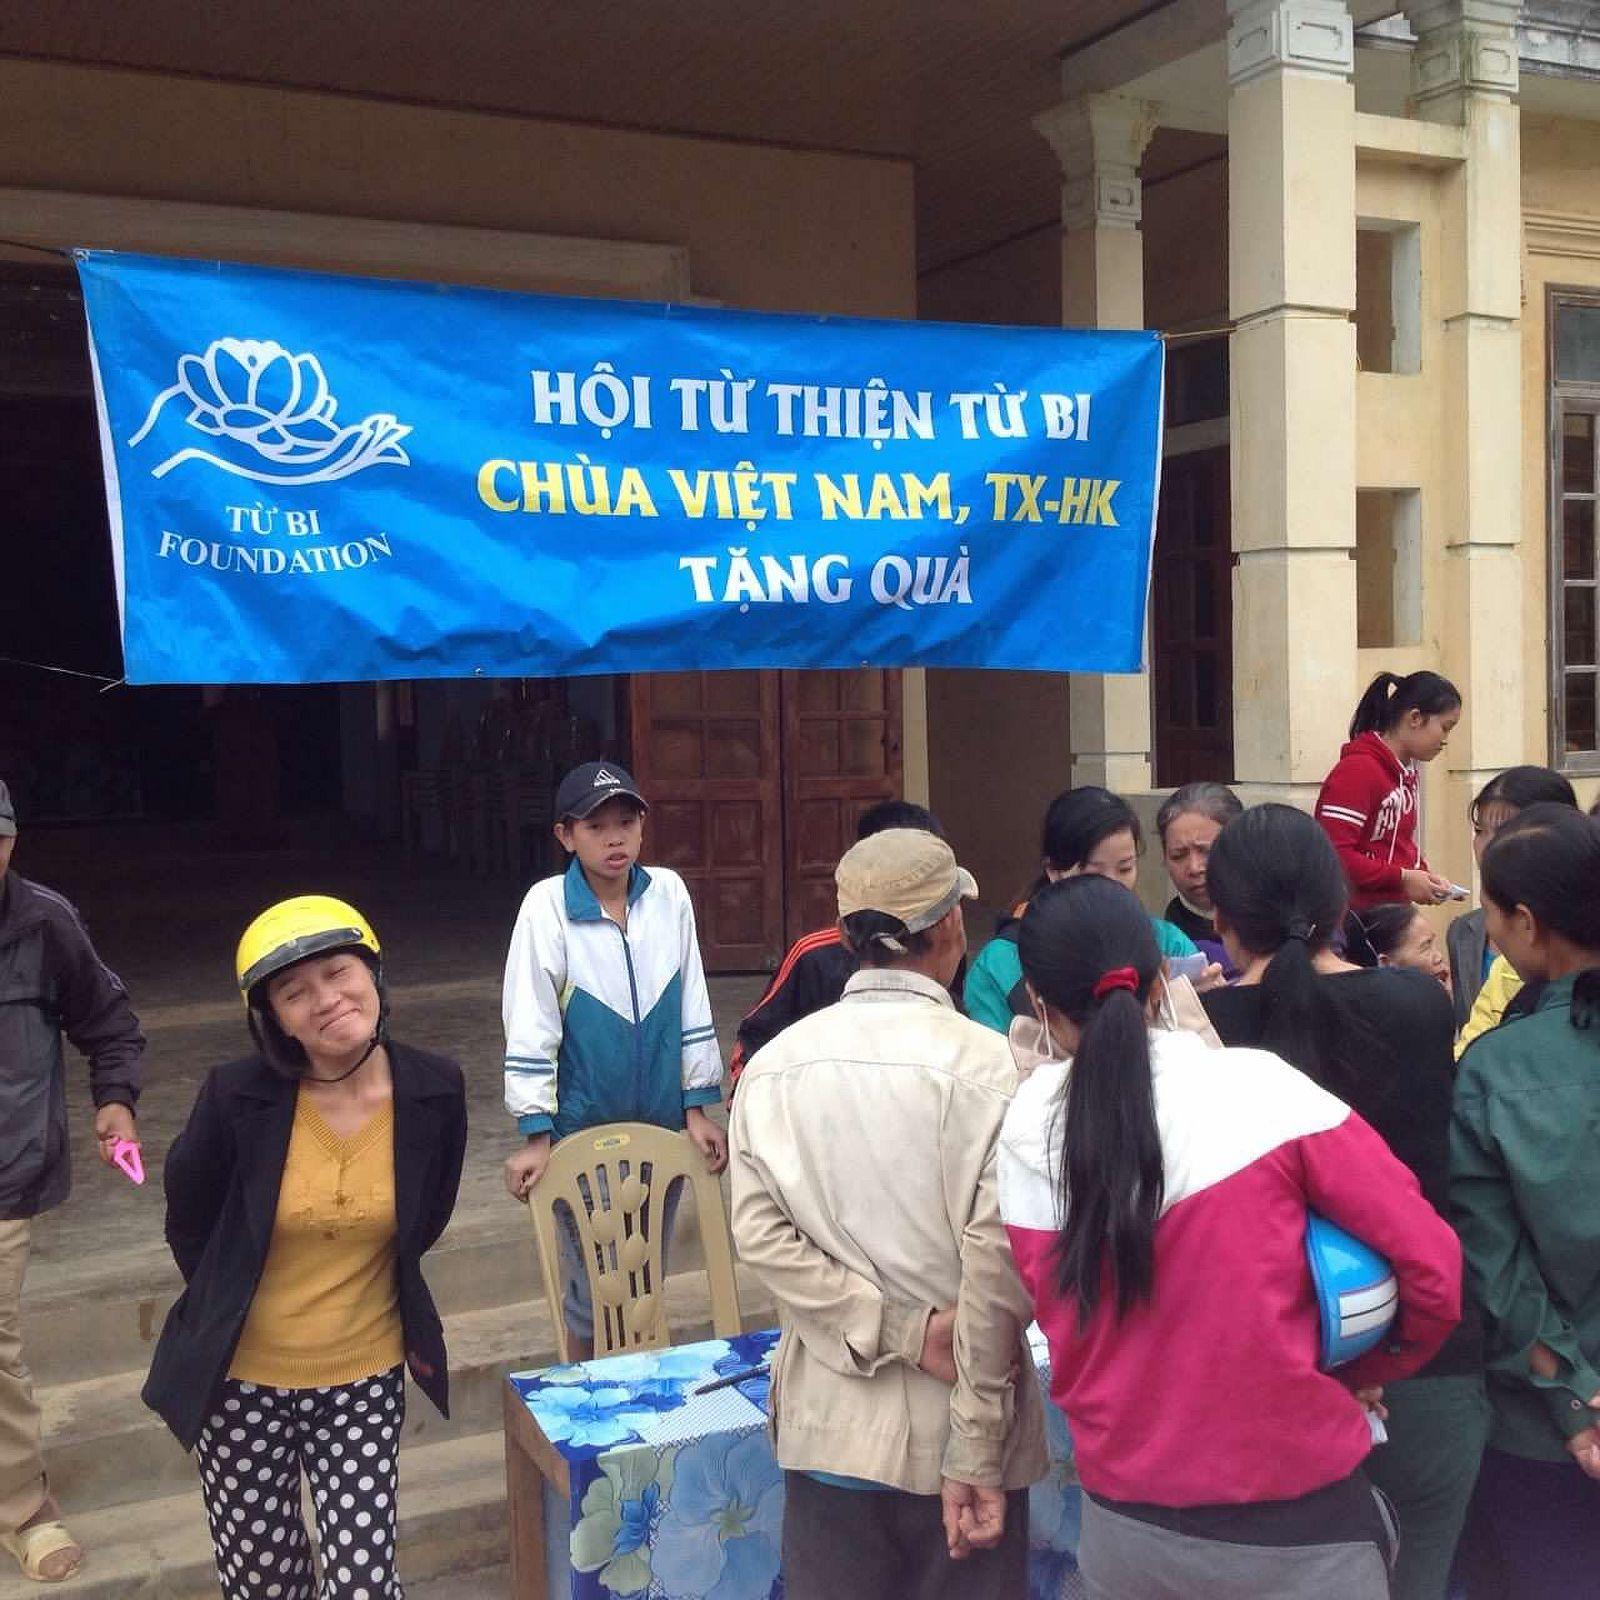 Quang Binh 5 (102)